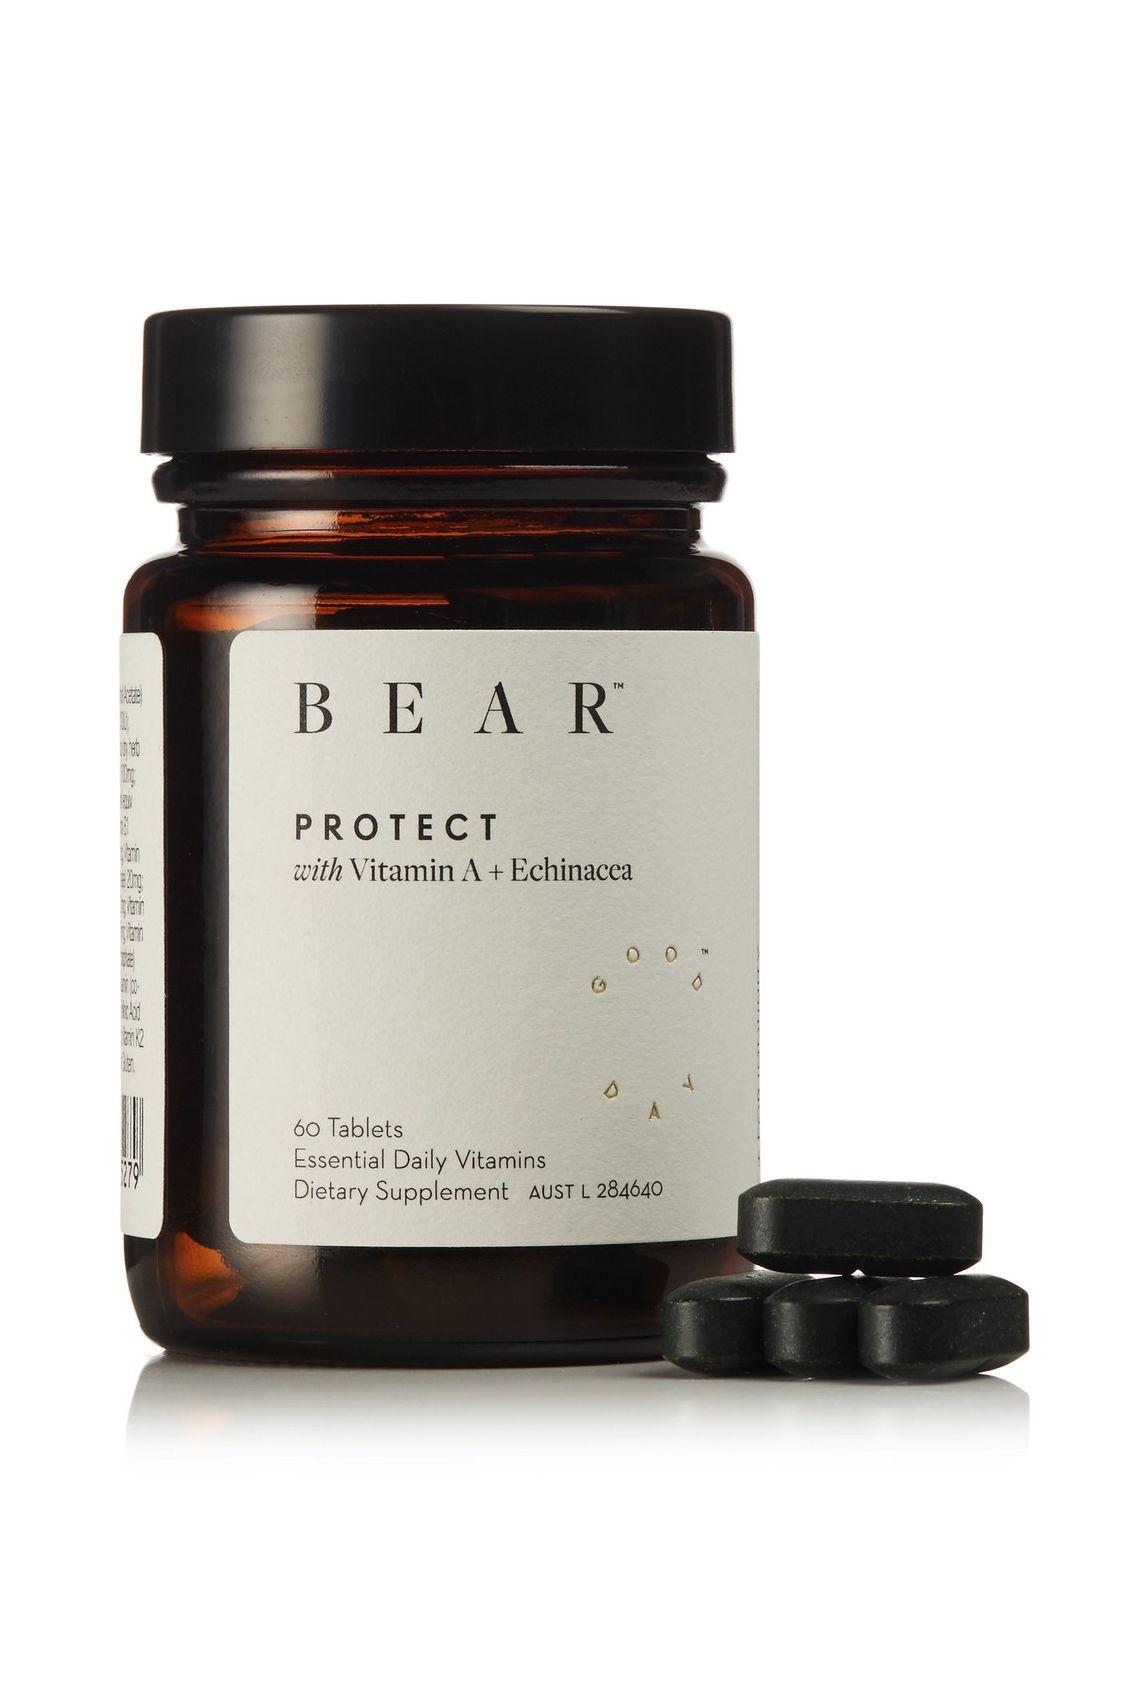 19 Best Beauty Supplements - Top Hair, Skin, and Collagen Supplement ...